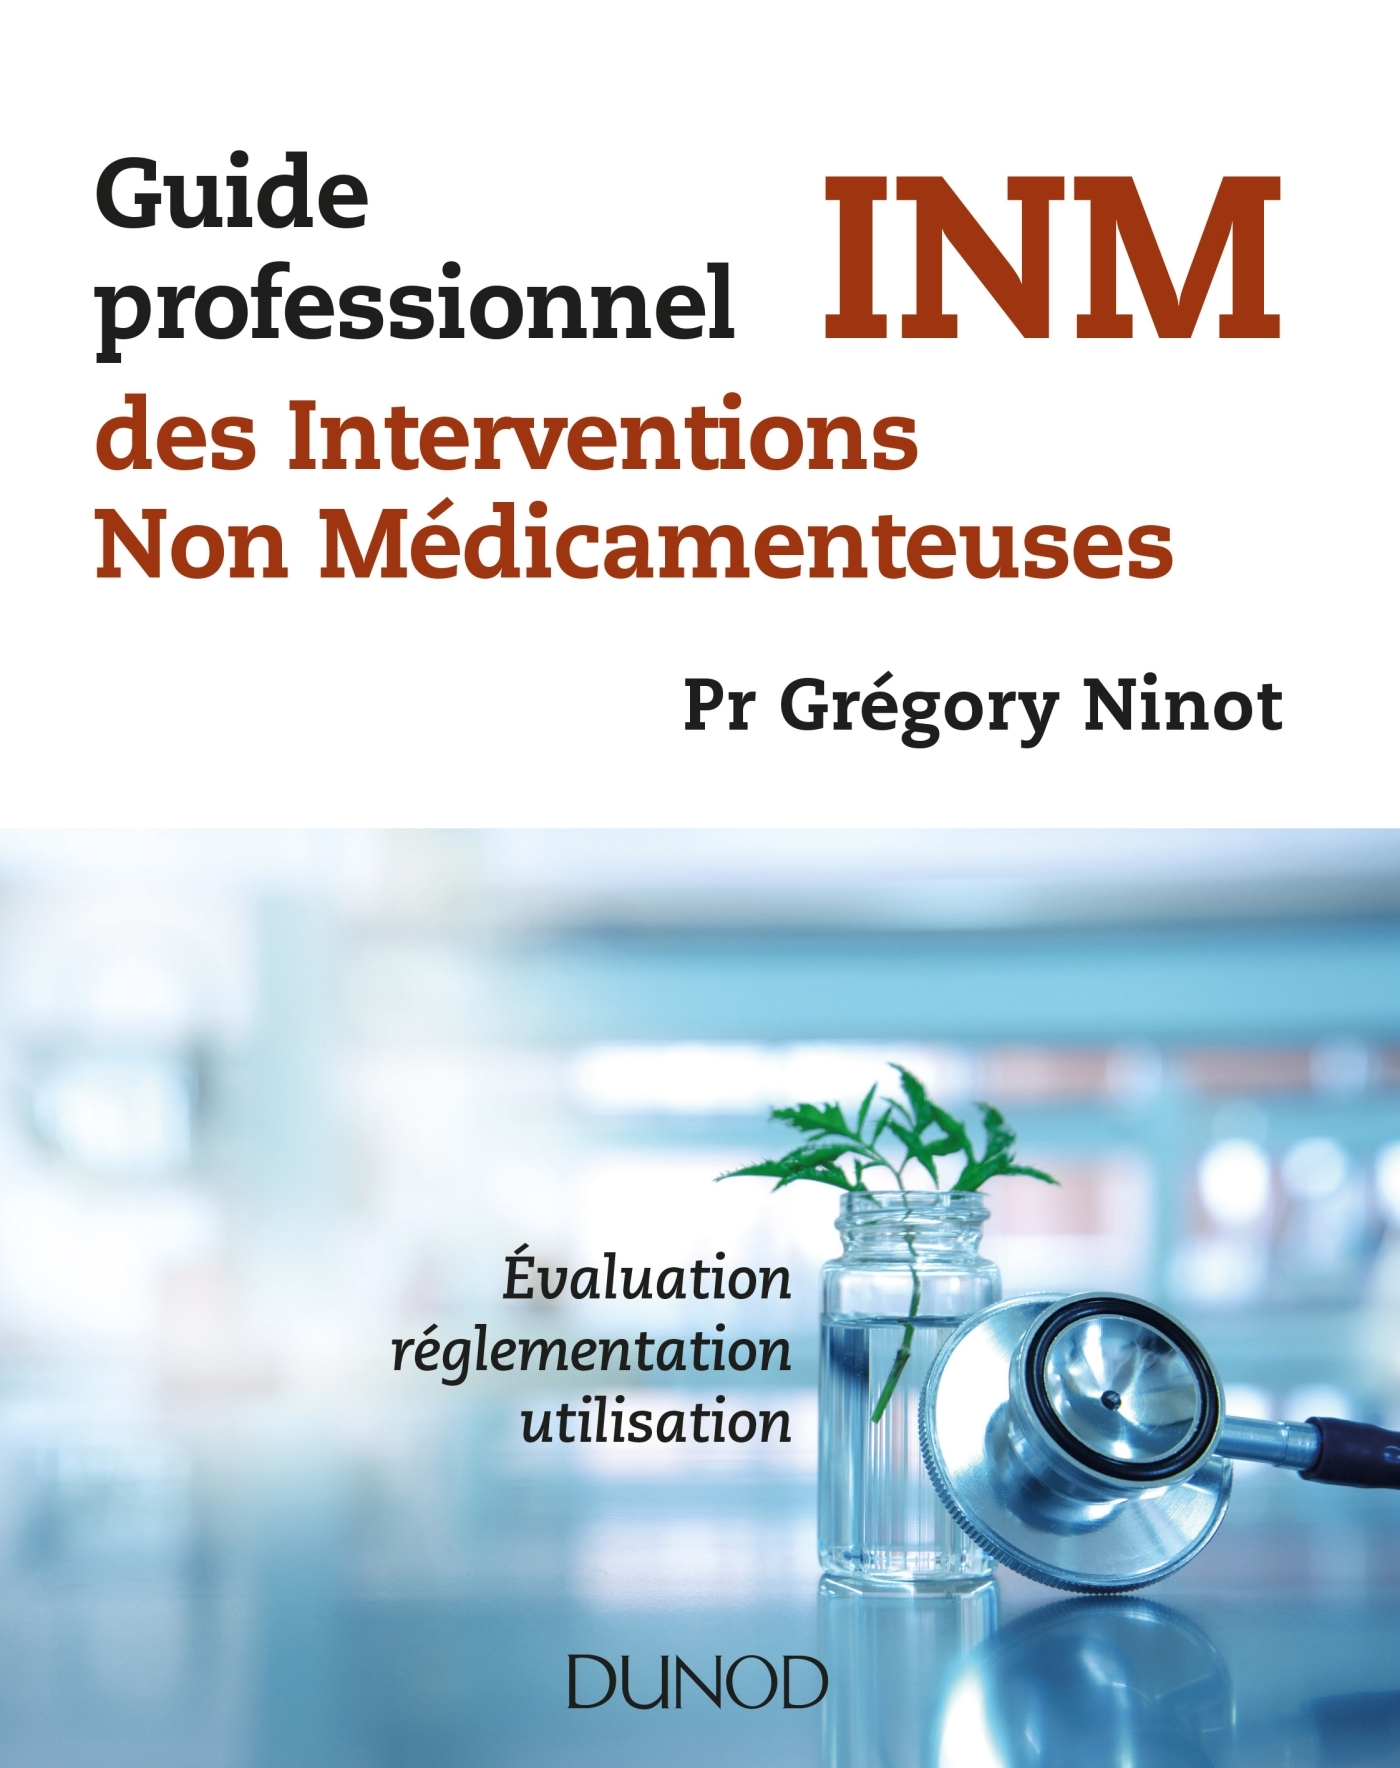 GUIDE PROFESSIONNEL DES INTERVENTIONS NON MEDICAMENTEUSES - INM